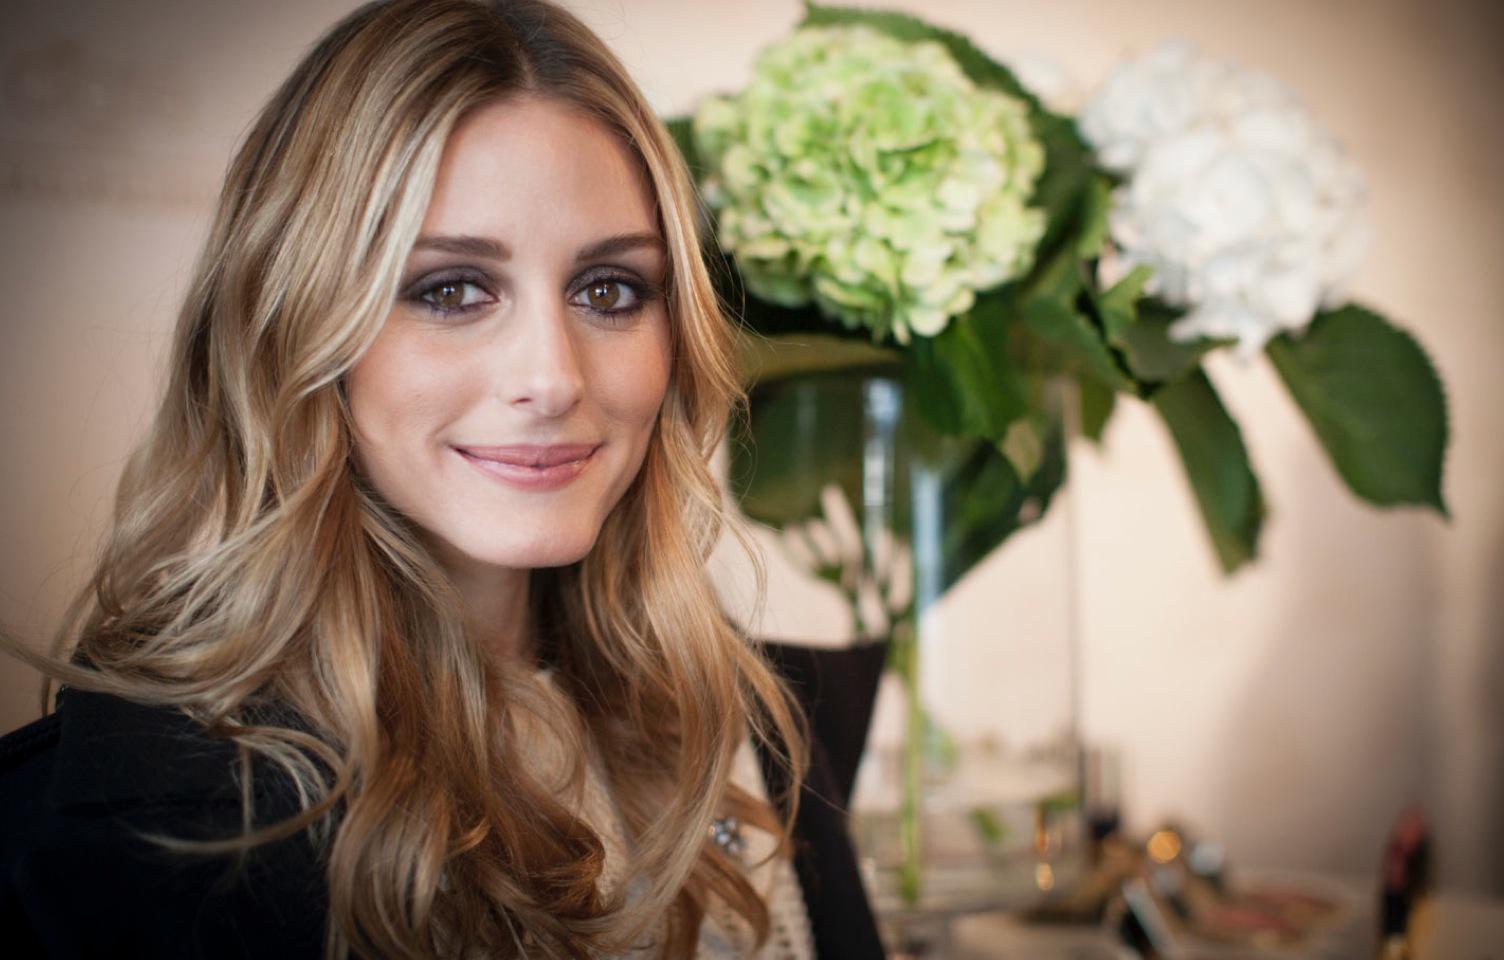 Amerikanska IT-tjejen Olivia Palermo frontar Ciate Londons nya makeup.